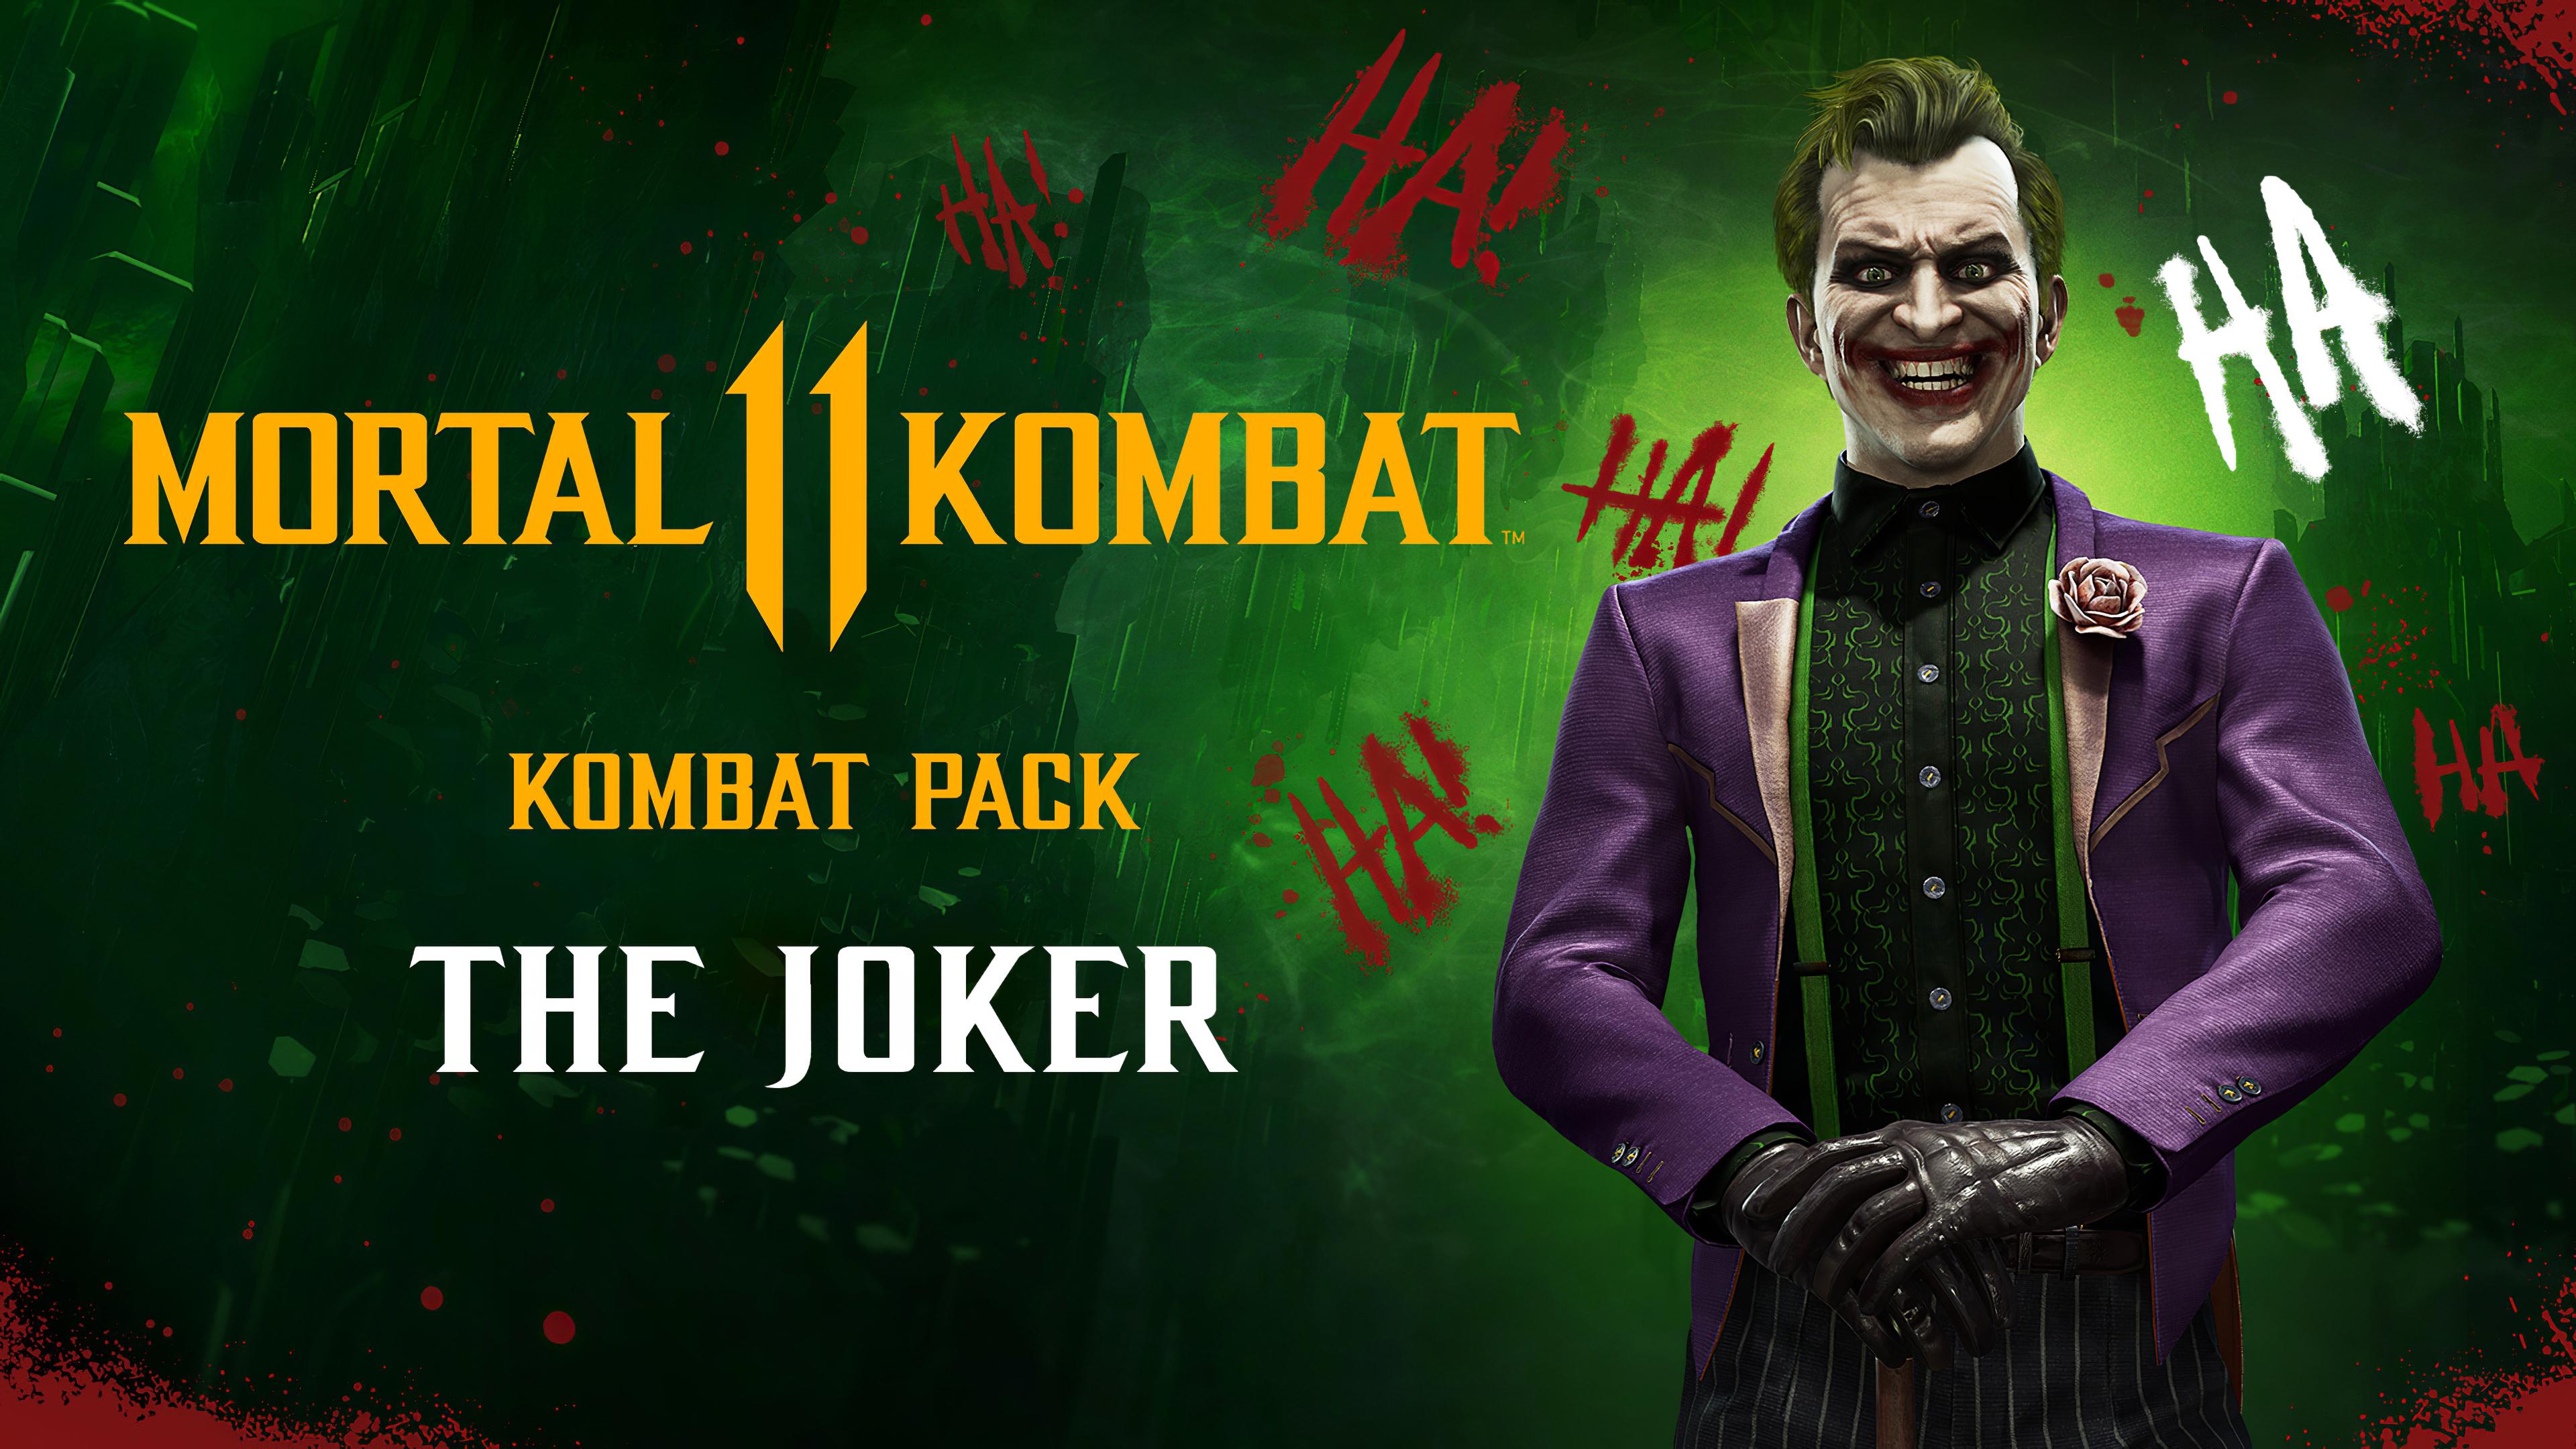 Wallpaper 4k The Joker Mortal Kombat 11 Joker In Mortal Kombat 11